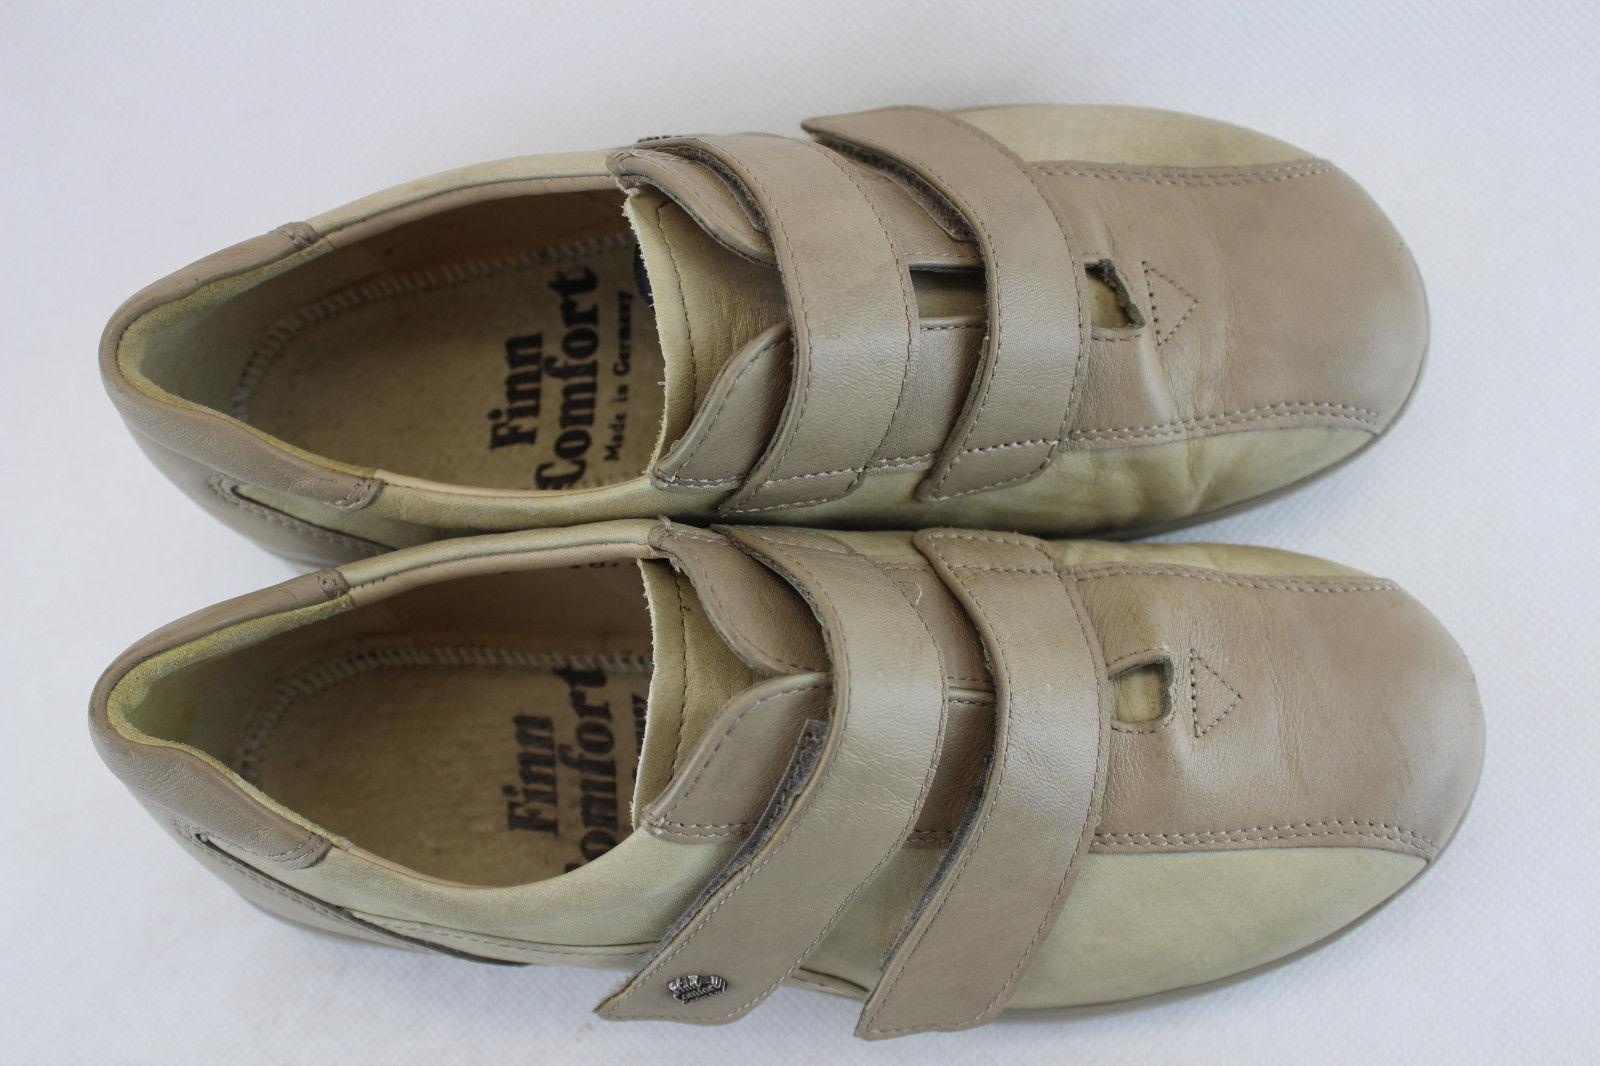 FINN COMFORT WOMENS - 6 1 2 2 2 US  (4   UK), NAIROBI ,  premium leather,  S-W-46 f67359